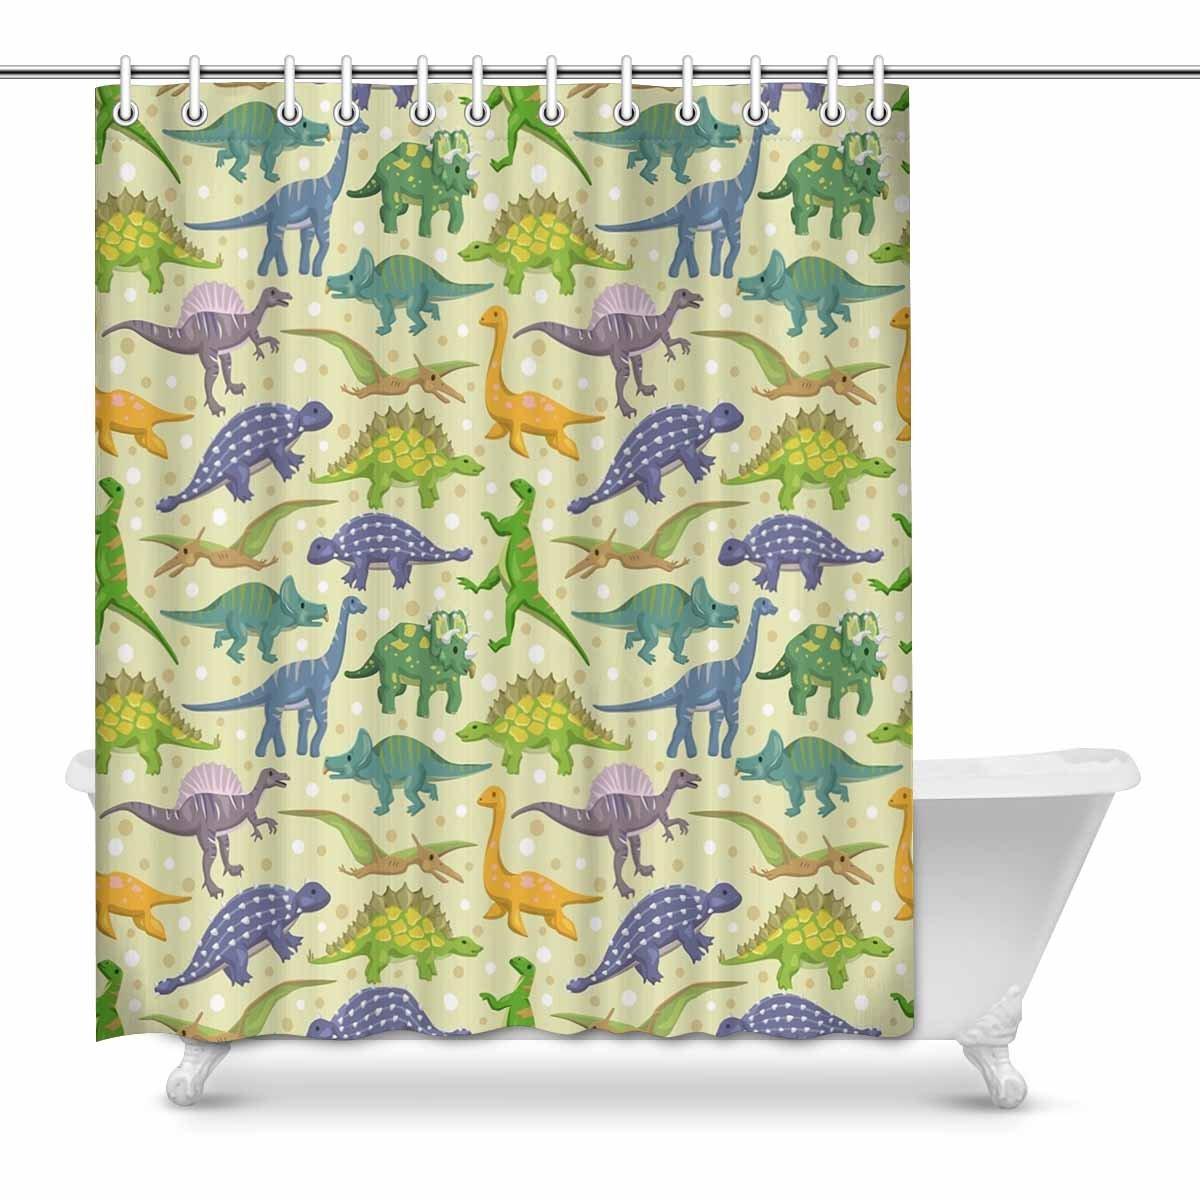 Pleasing Amazon Com Interestprint Dinosaur Pattern Print Art Decor Download Free Architecture Designs Jebrpmadebymaigaardcom